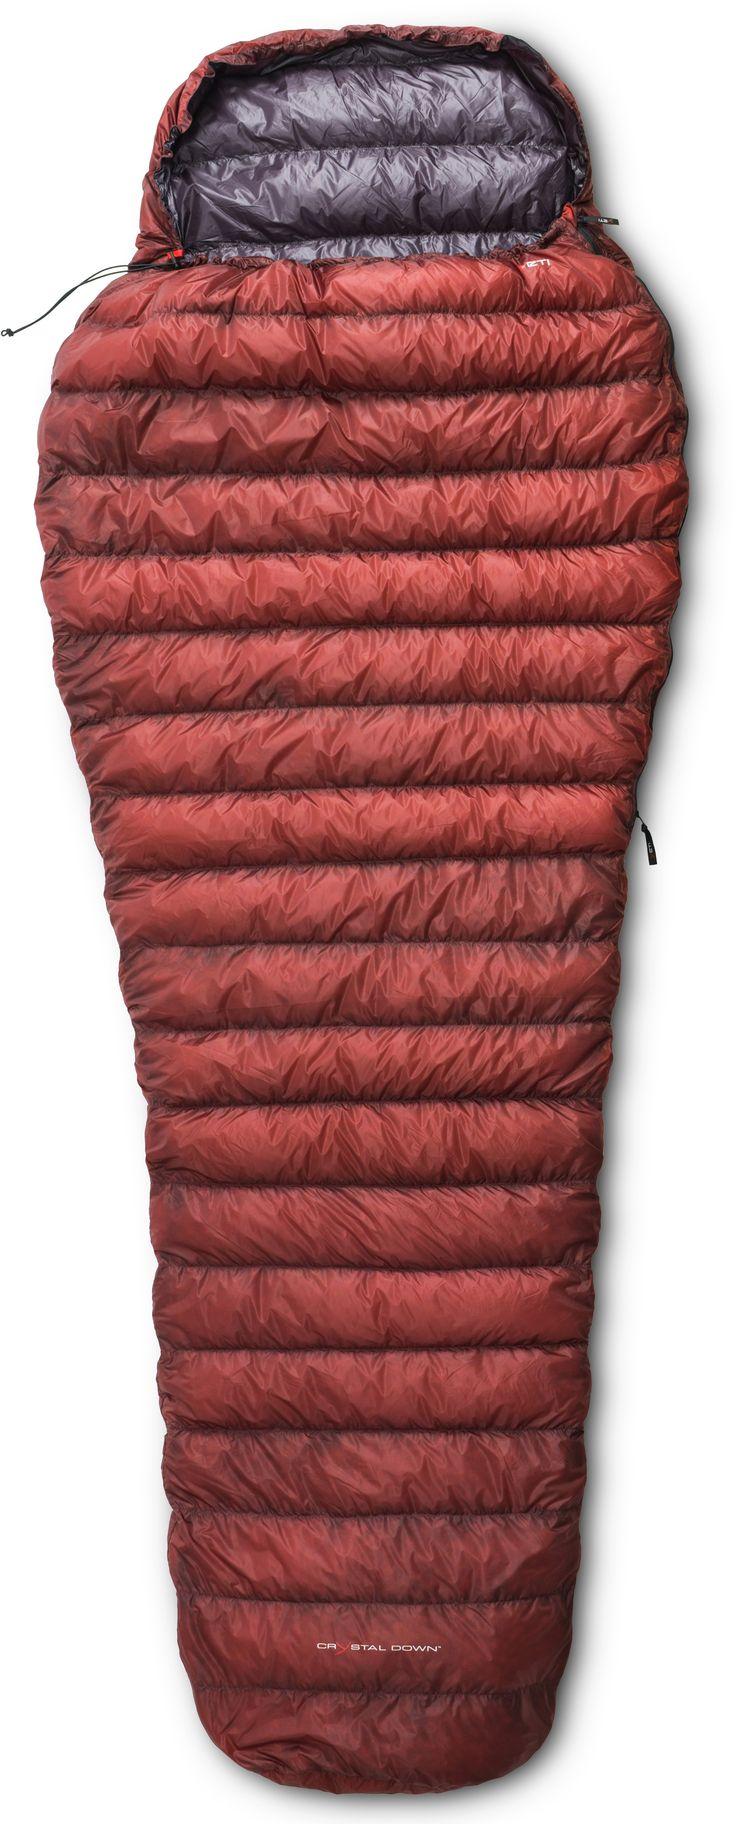 The ultimate lightweight sleeping bag